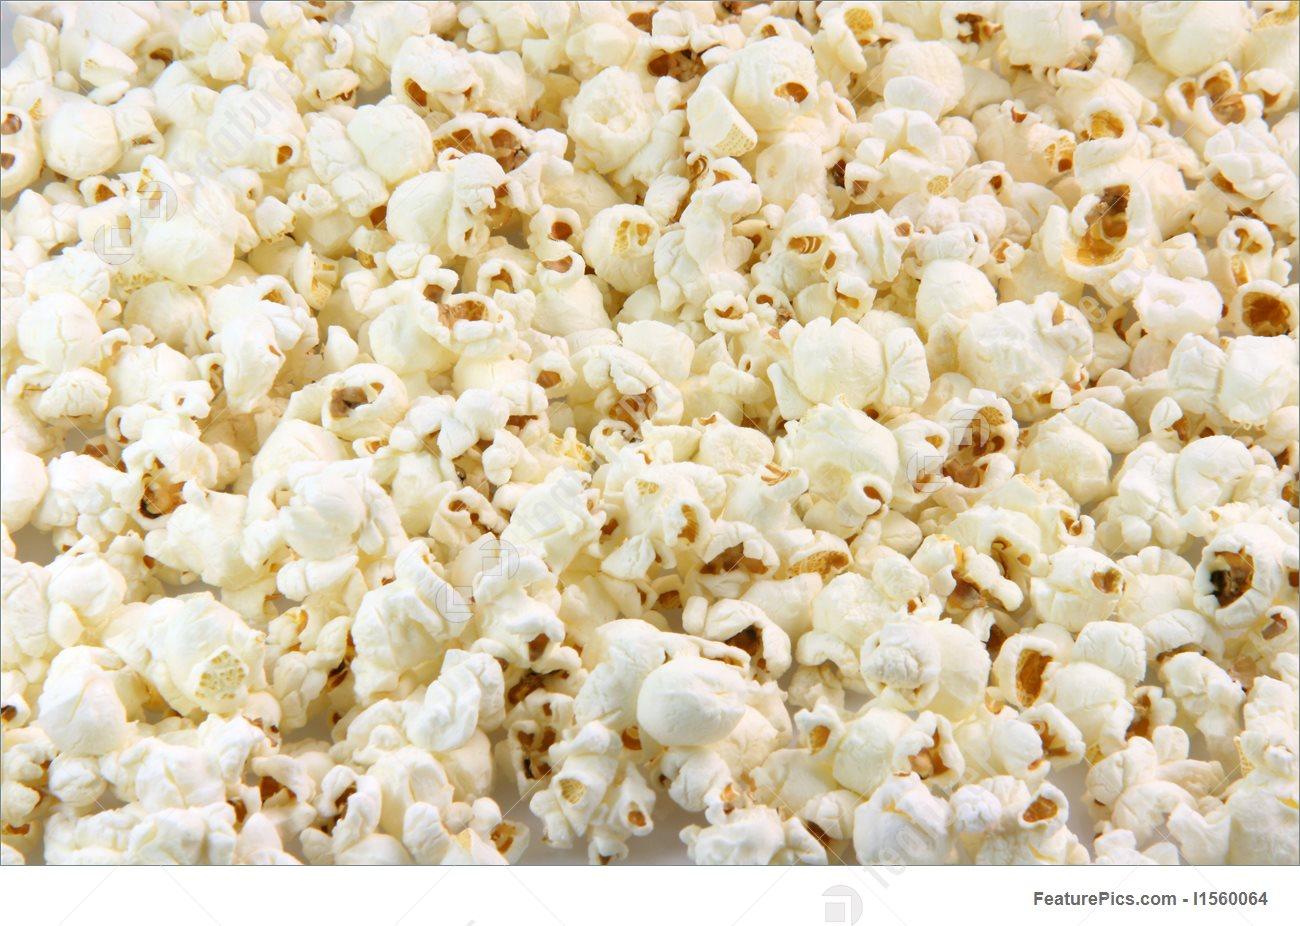 Popcorn Background Stock Image I1560064 at FeaturePics 1300x926